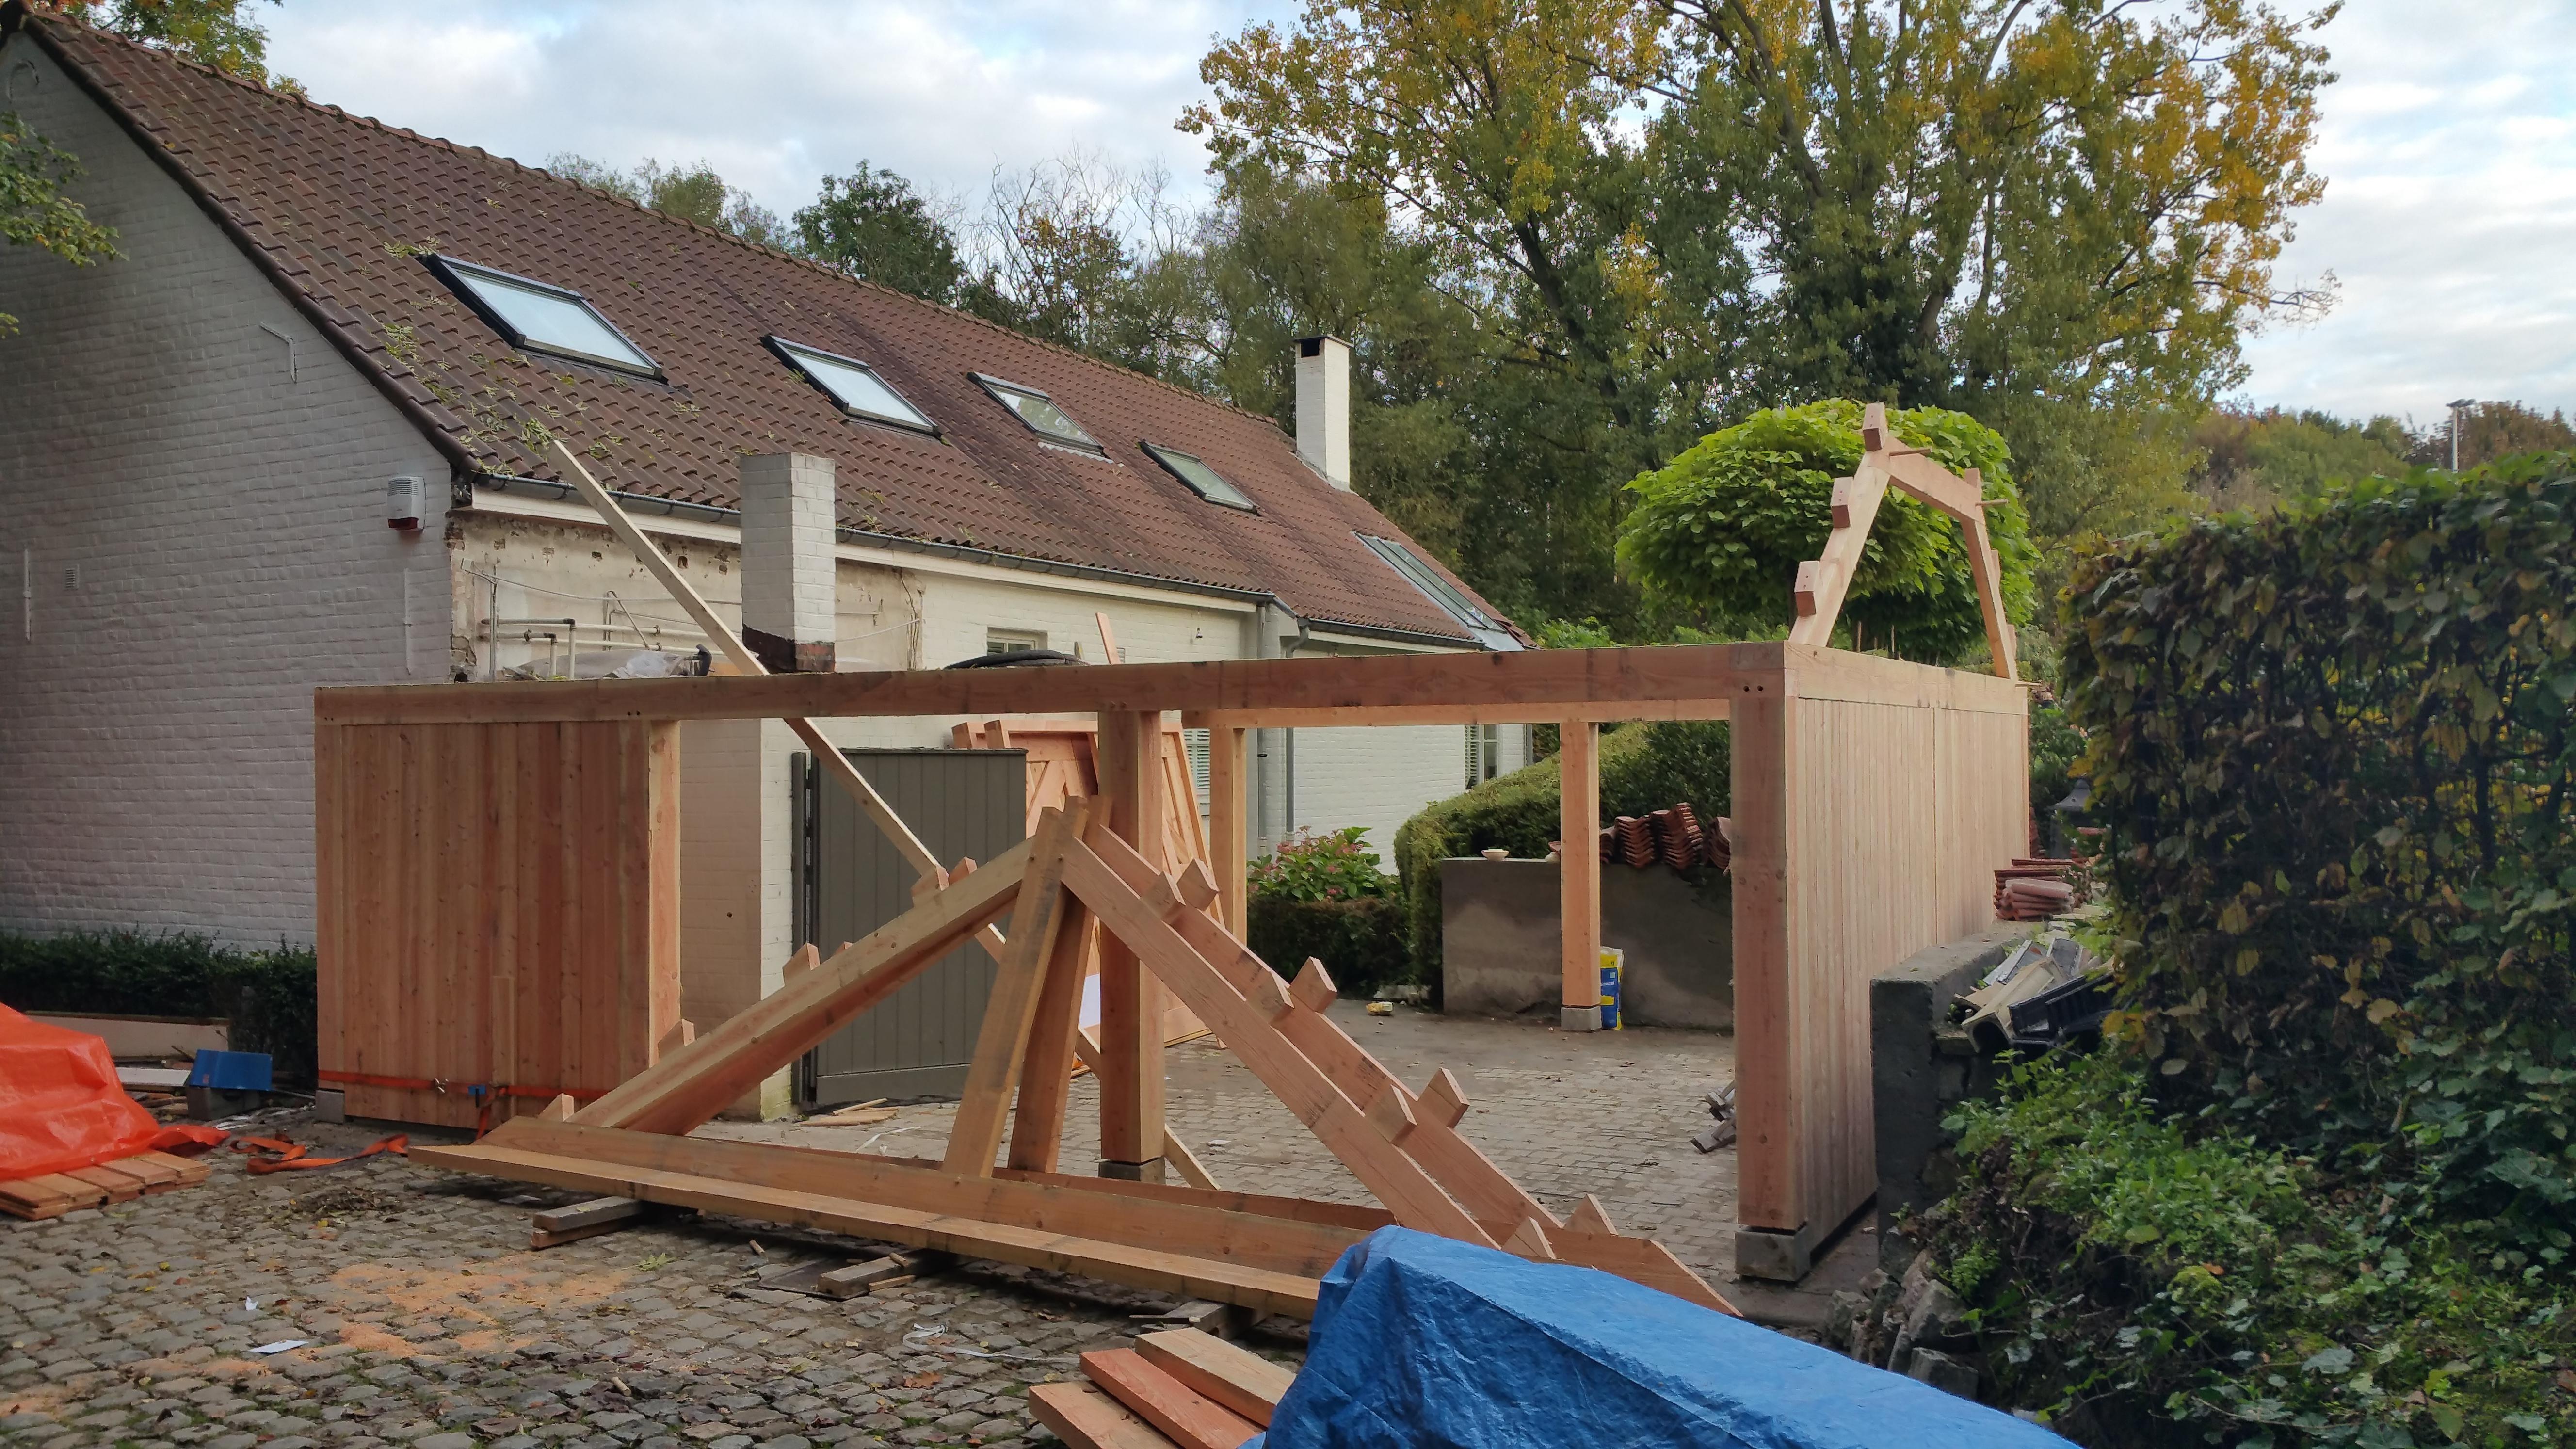 http://www.houtsolutions.nl/wp-content/uploads/2015/10/20151020_172918.jpg